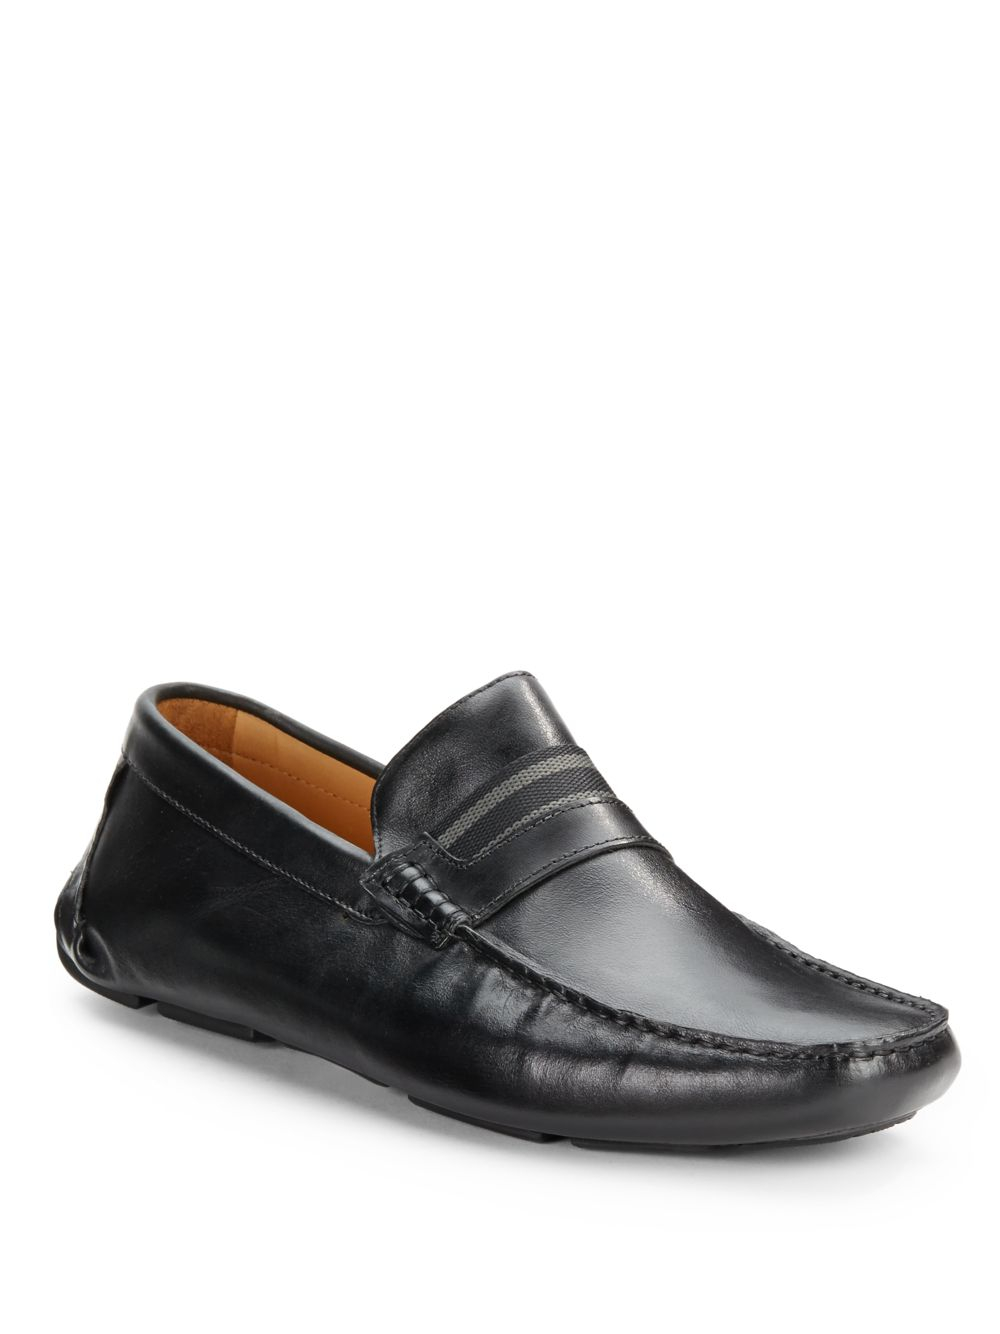 saks fifth avenue black label leather venetian shoes in